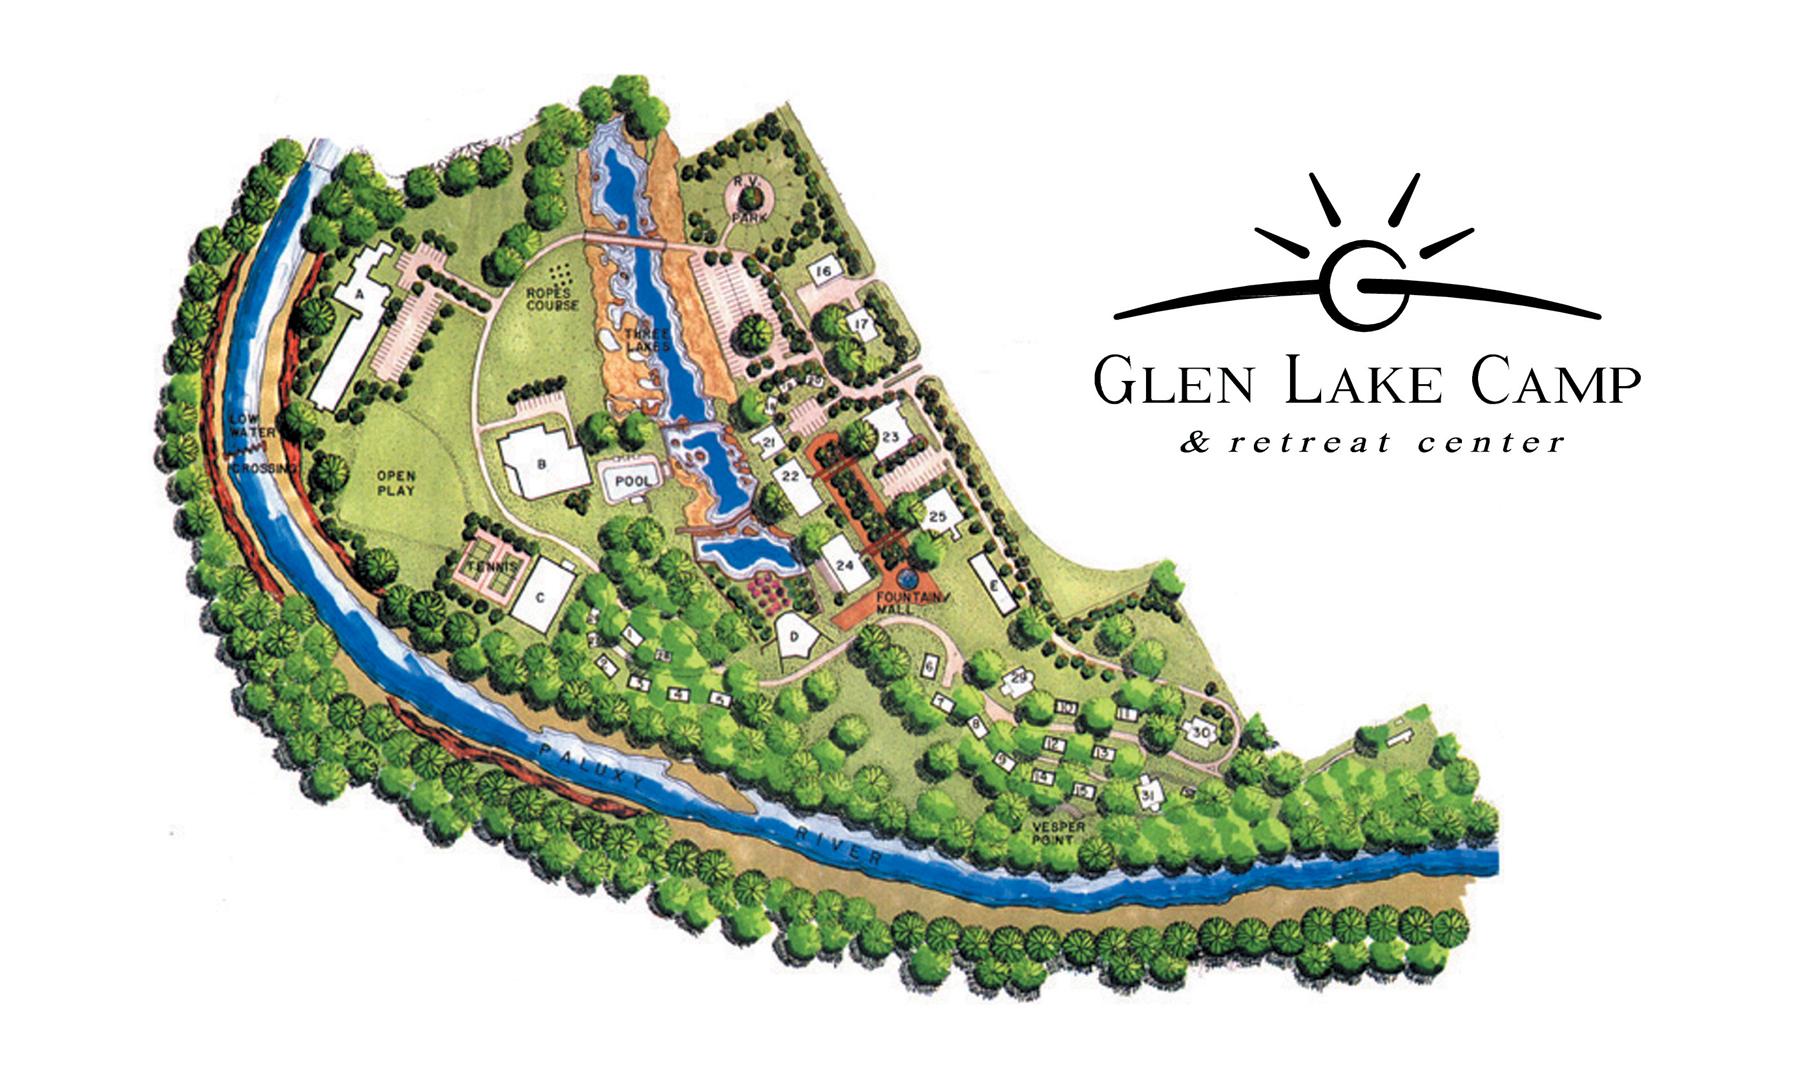 Glenlake-Camp-Retreat-Center